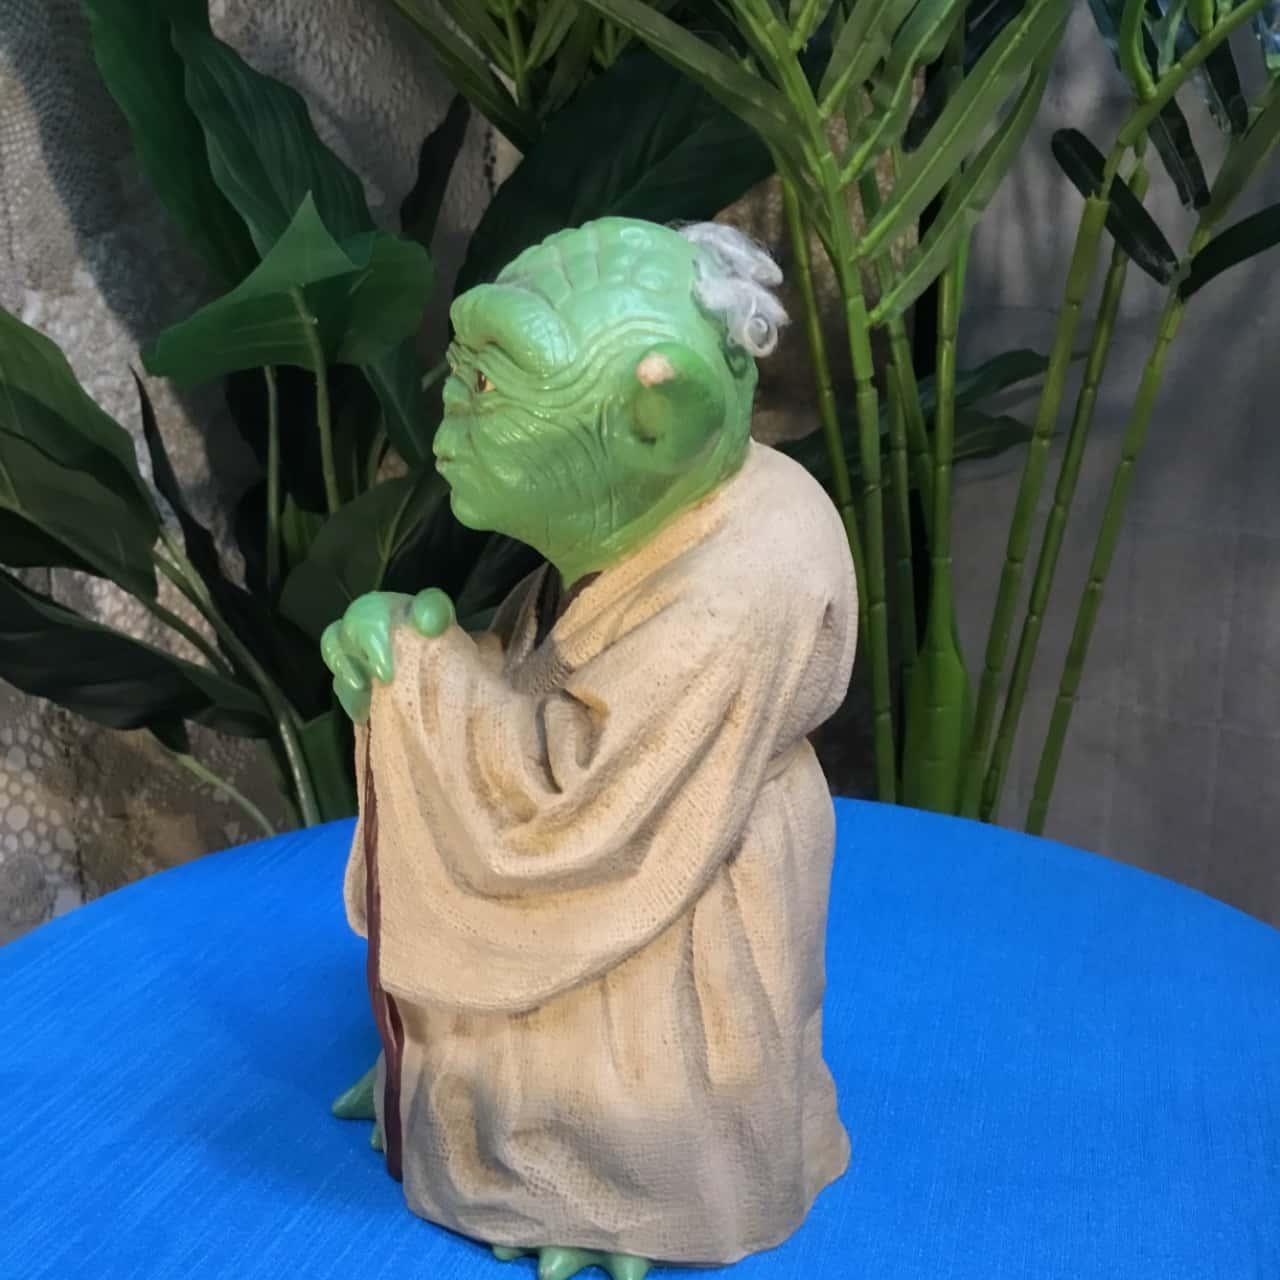 Vintage Star Wars 1981 Rubber Yoda standing figure